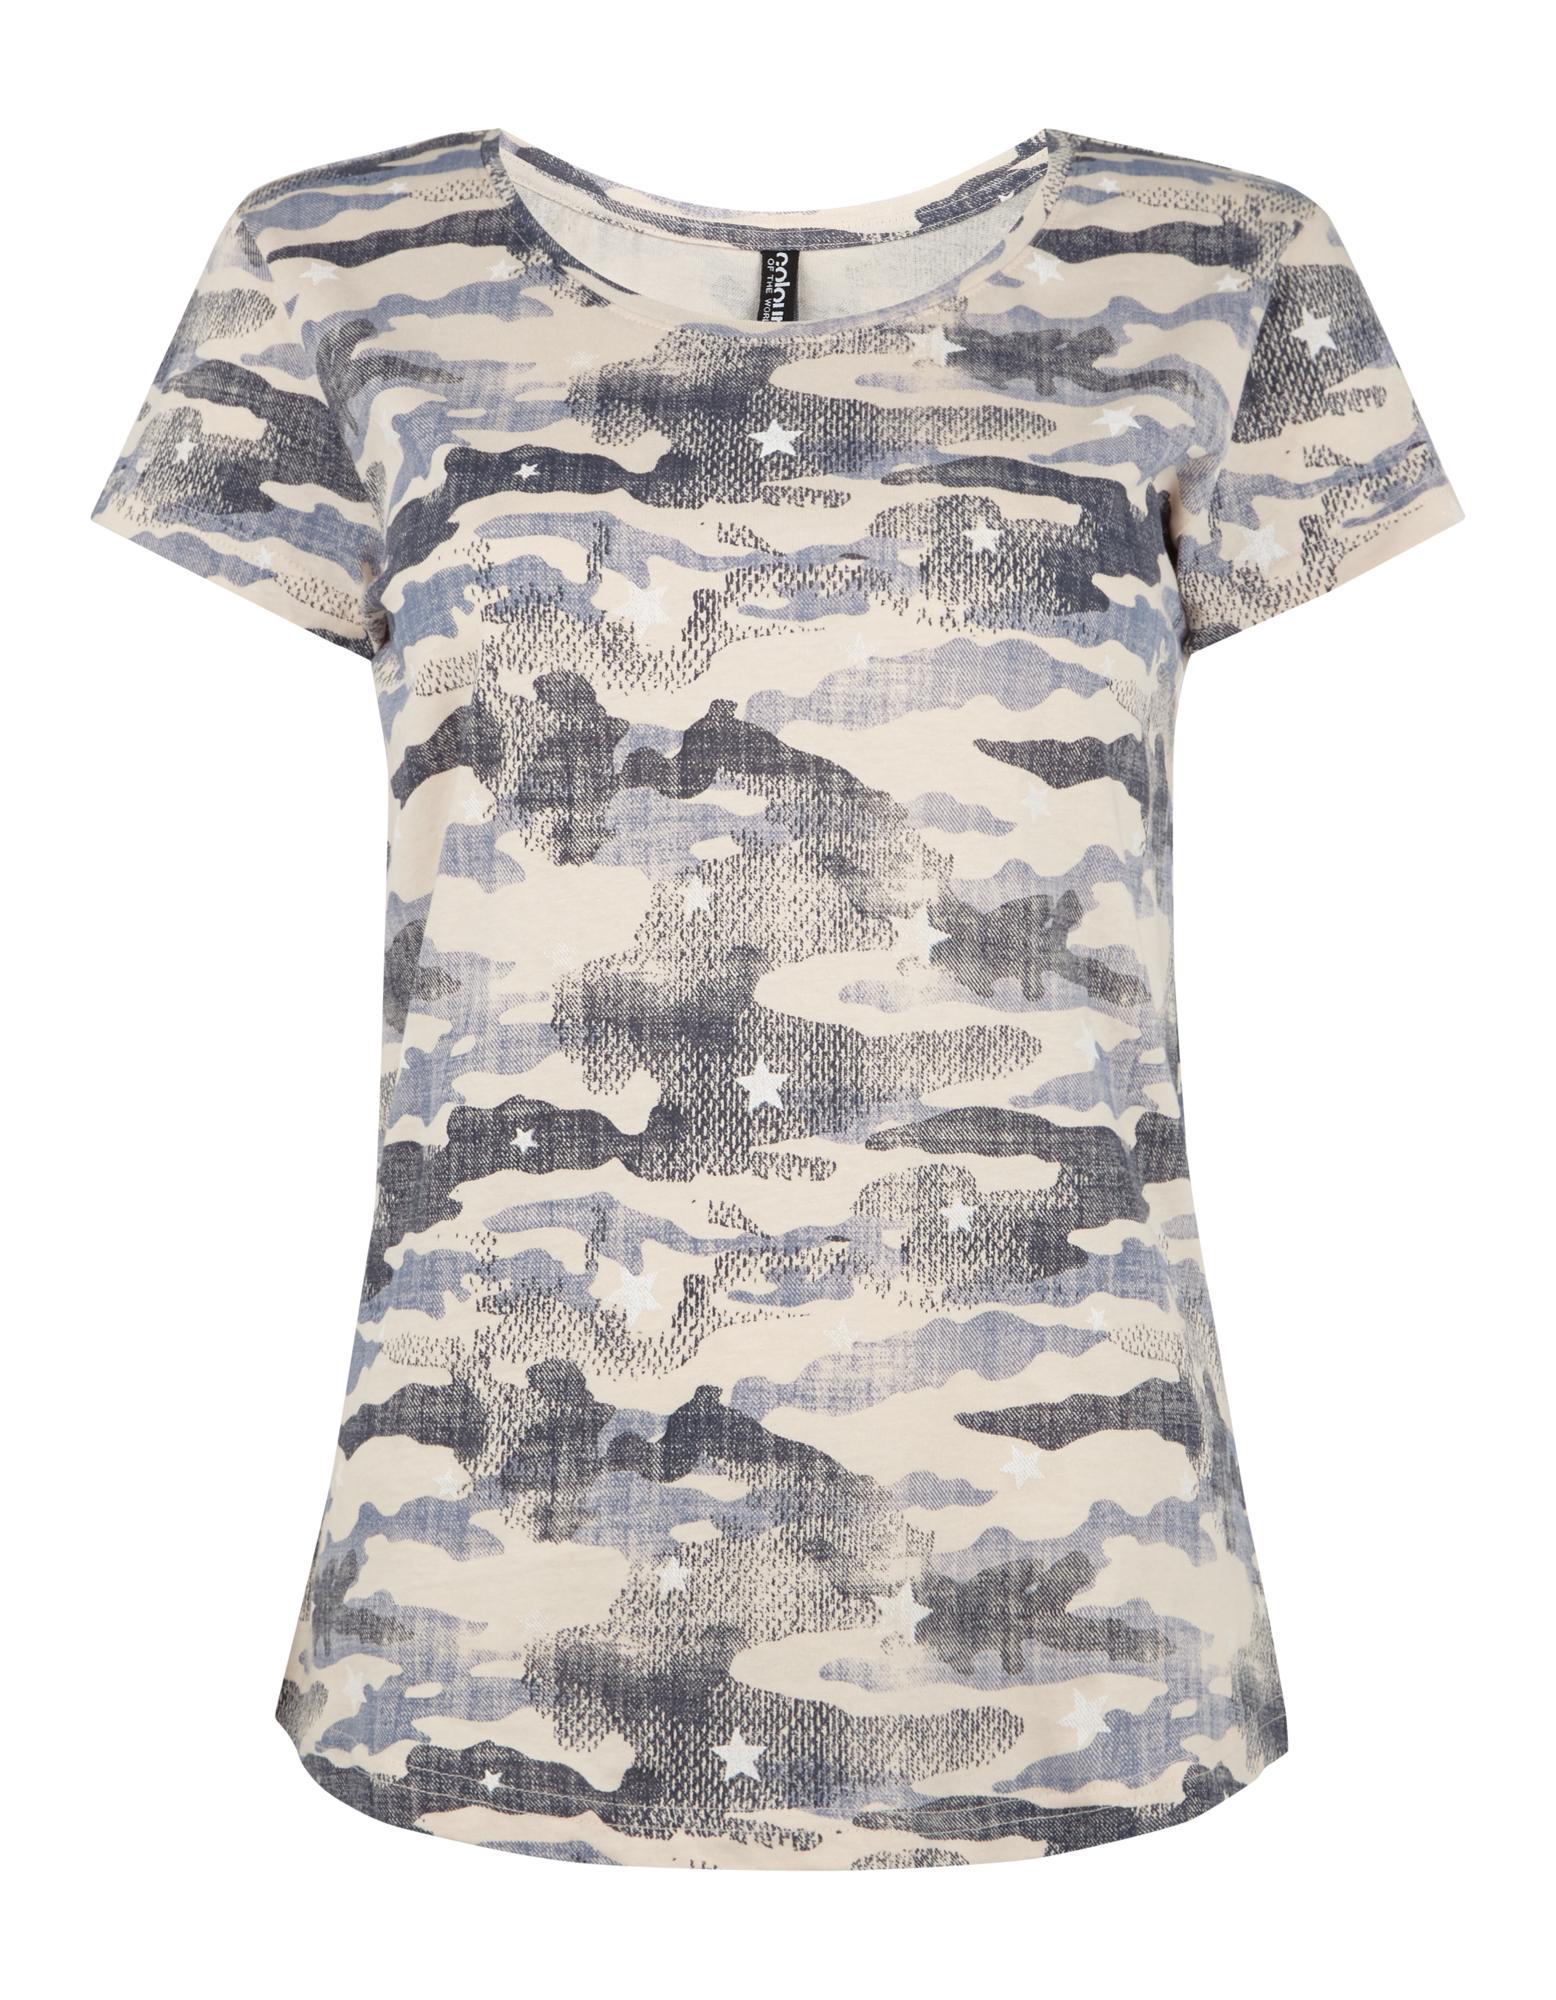 damen t shirt mit camouflage muster takko fashion. Black Bedroom Furniture Sets. Home Design Ideas